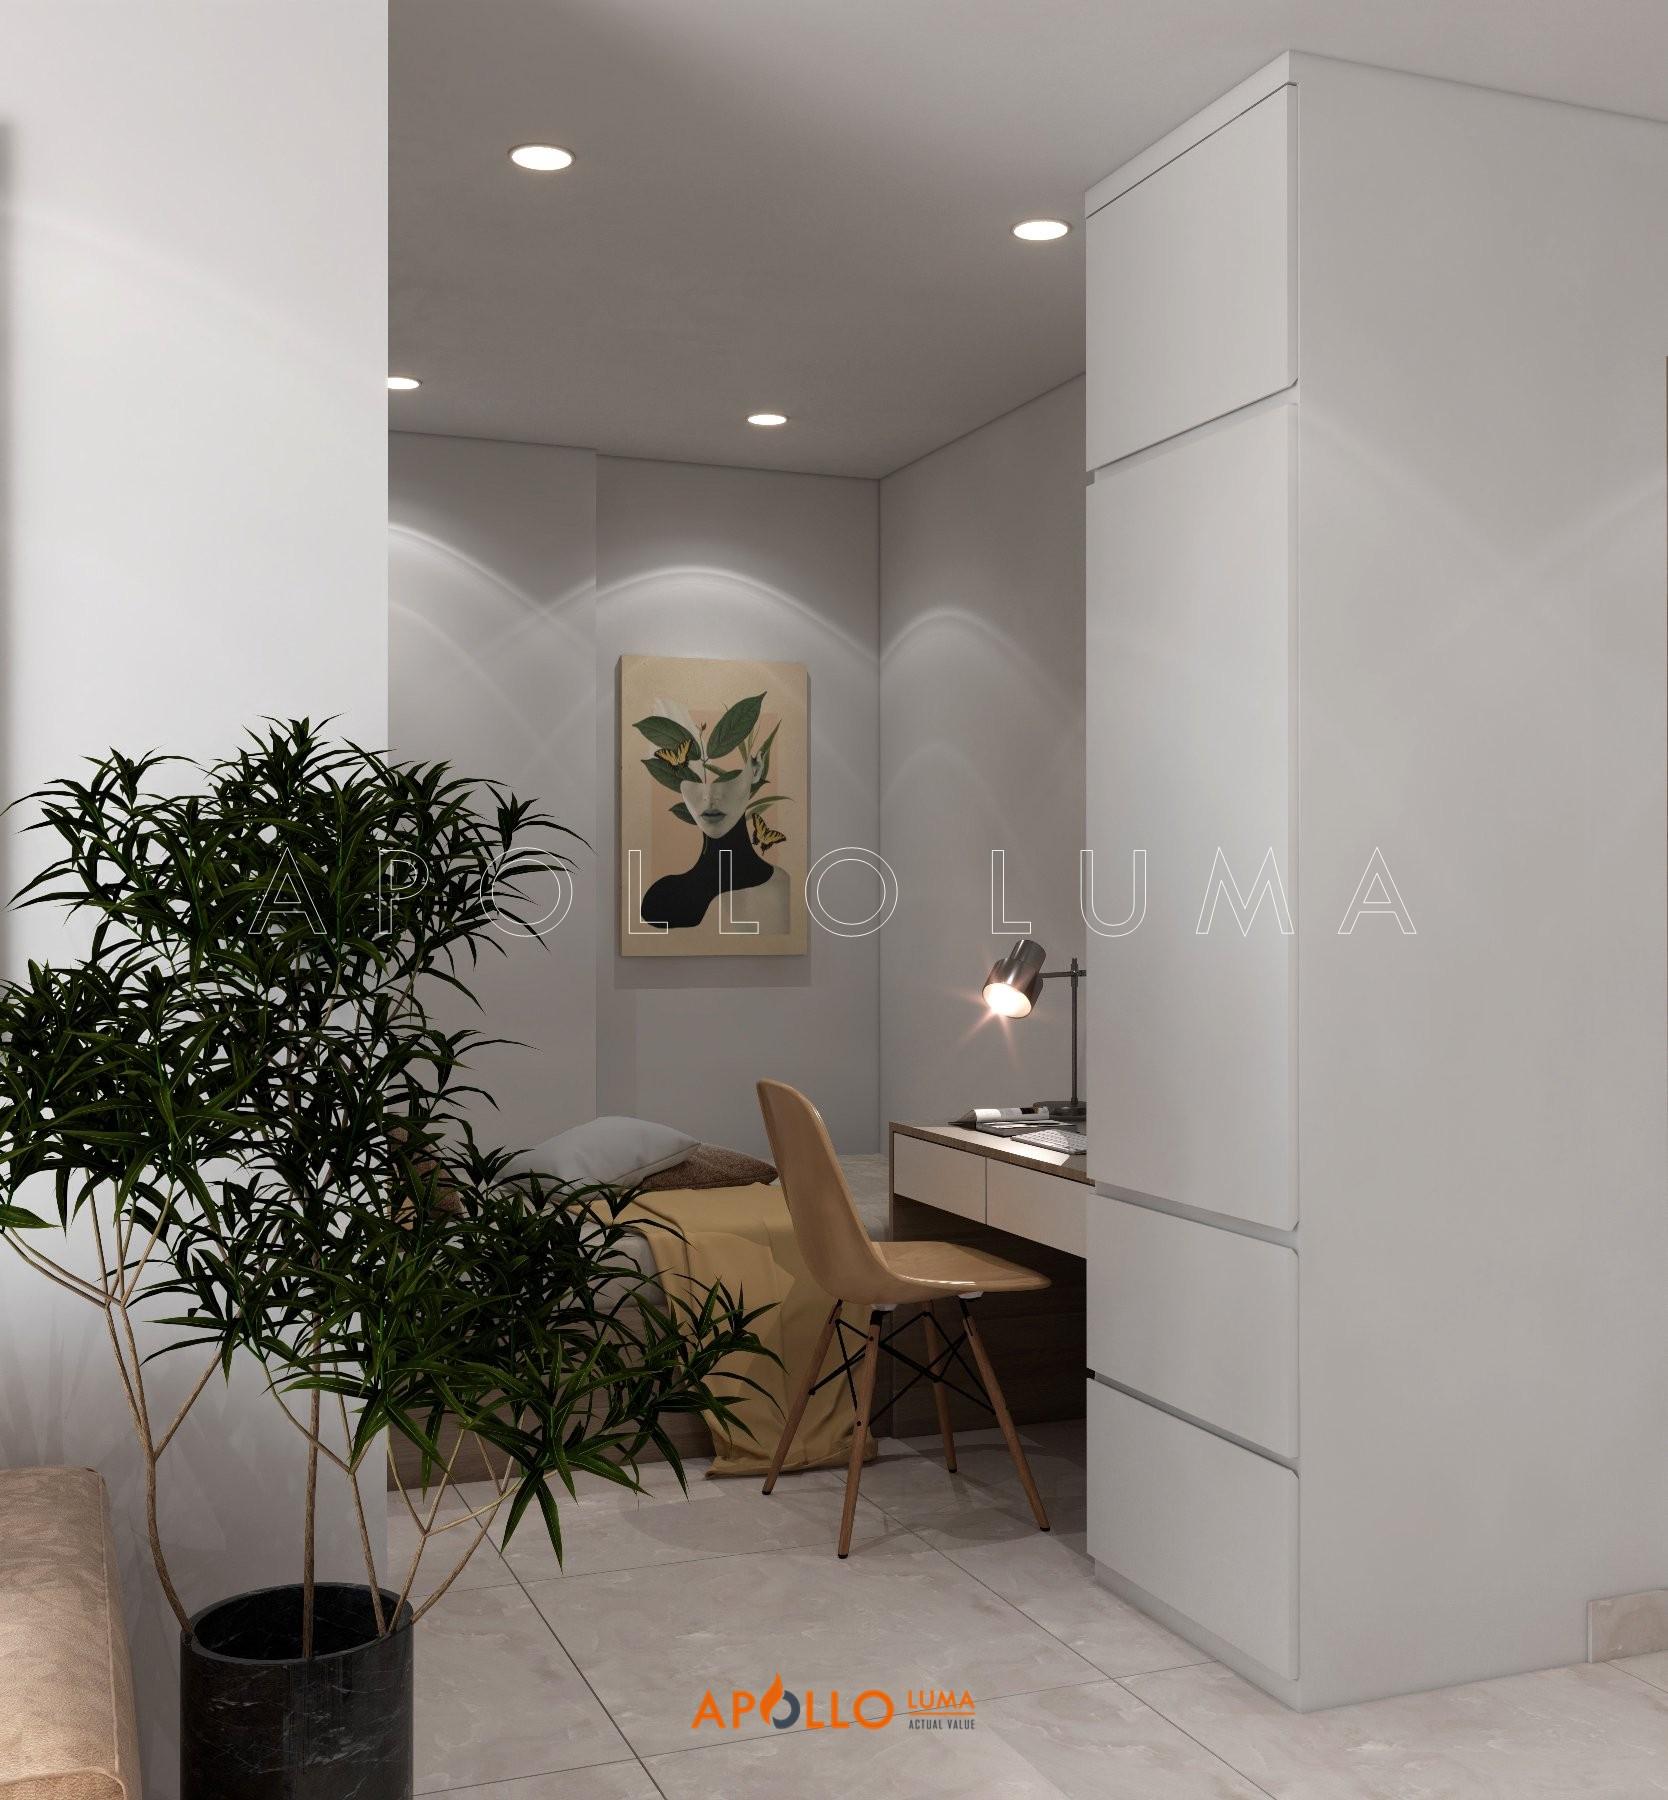 Thiết kế nội thất căn hộ 1PN+1 (43m2) S2.19-01 Vinhomes Ocean Park